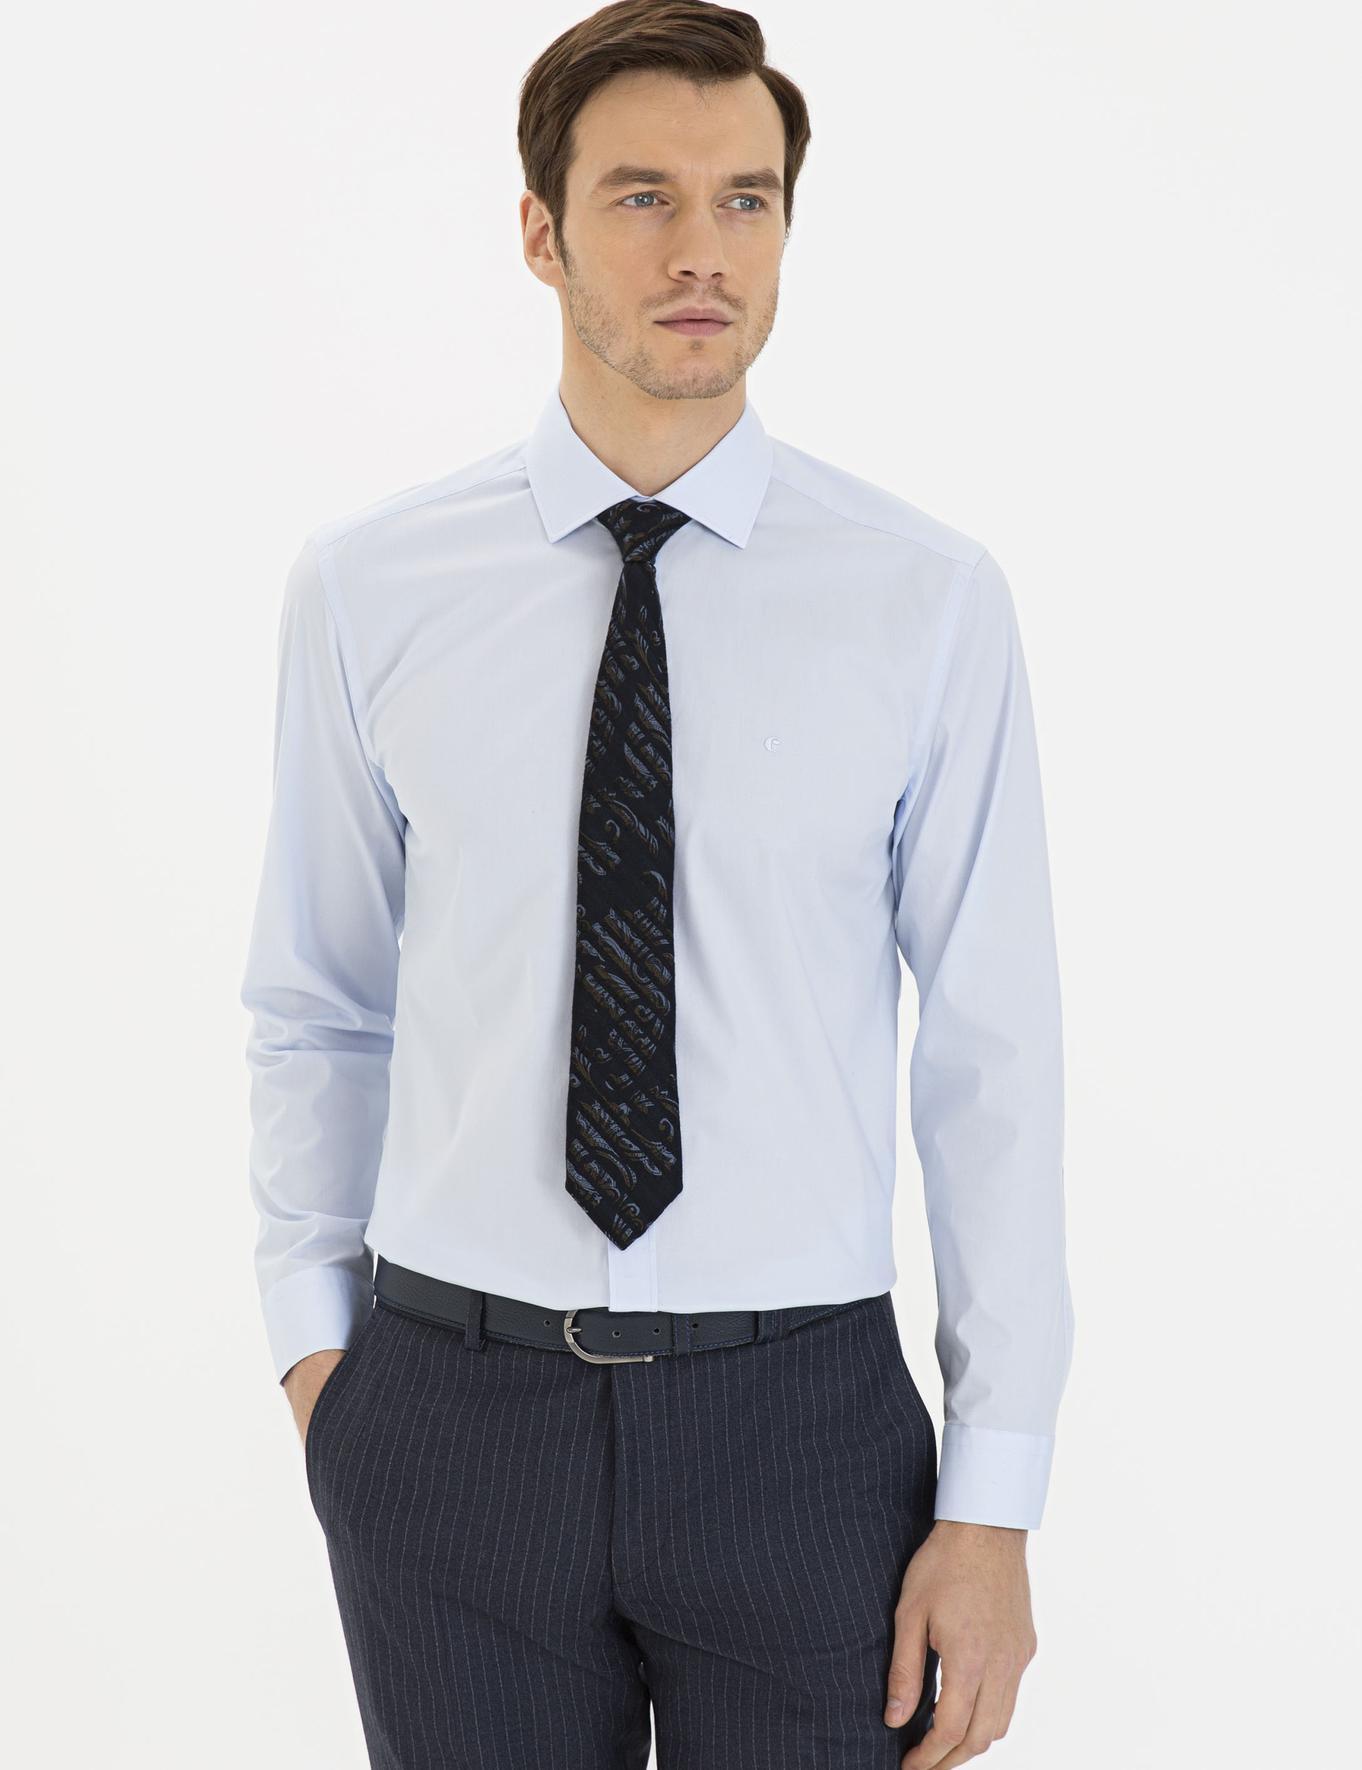 Açık Mavi Slim Fit Gömlek - 50229437027